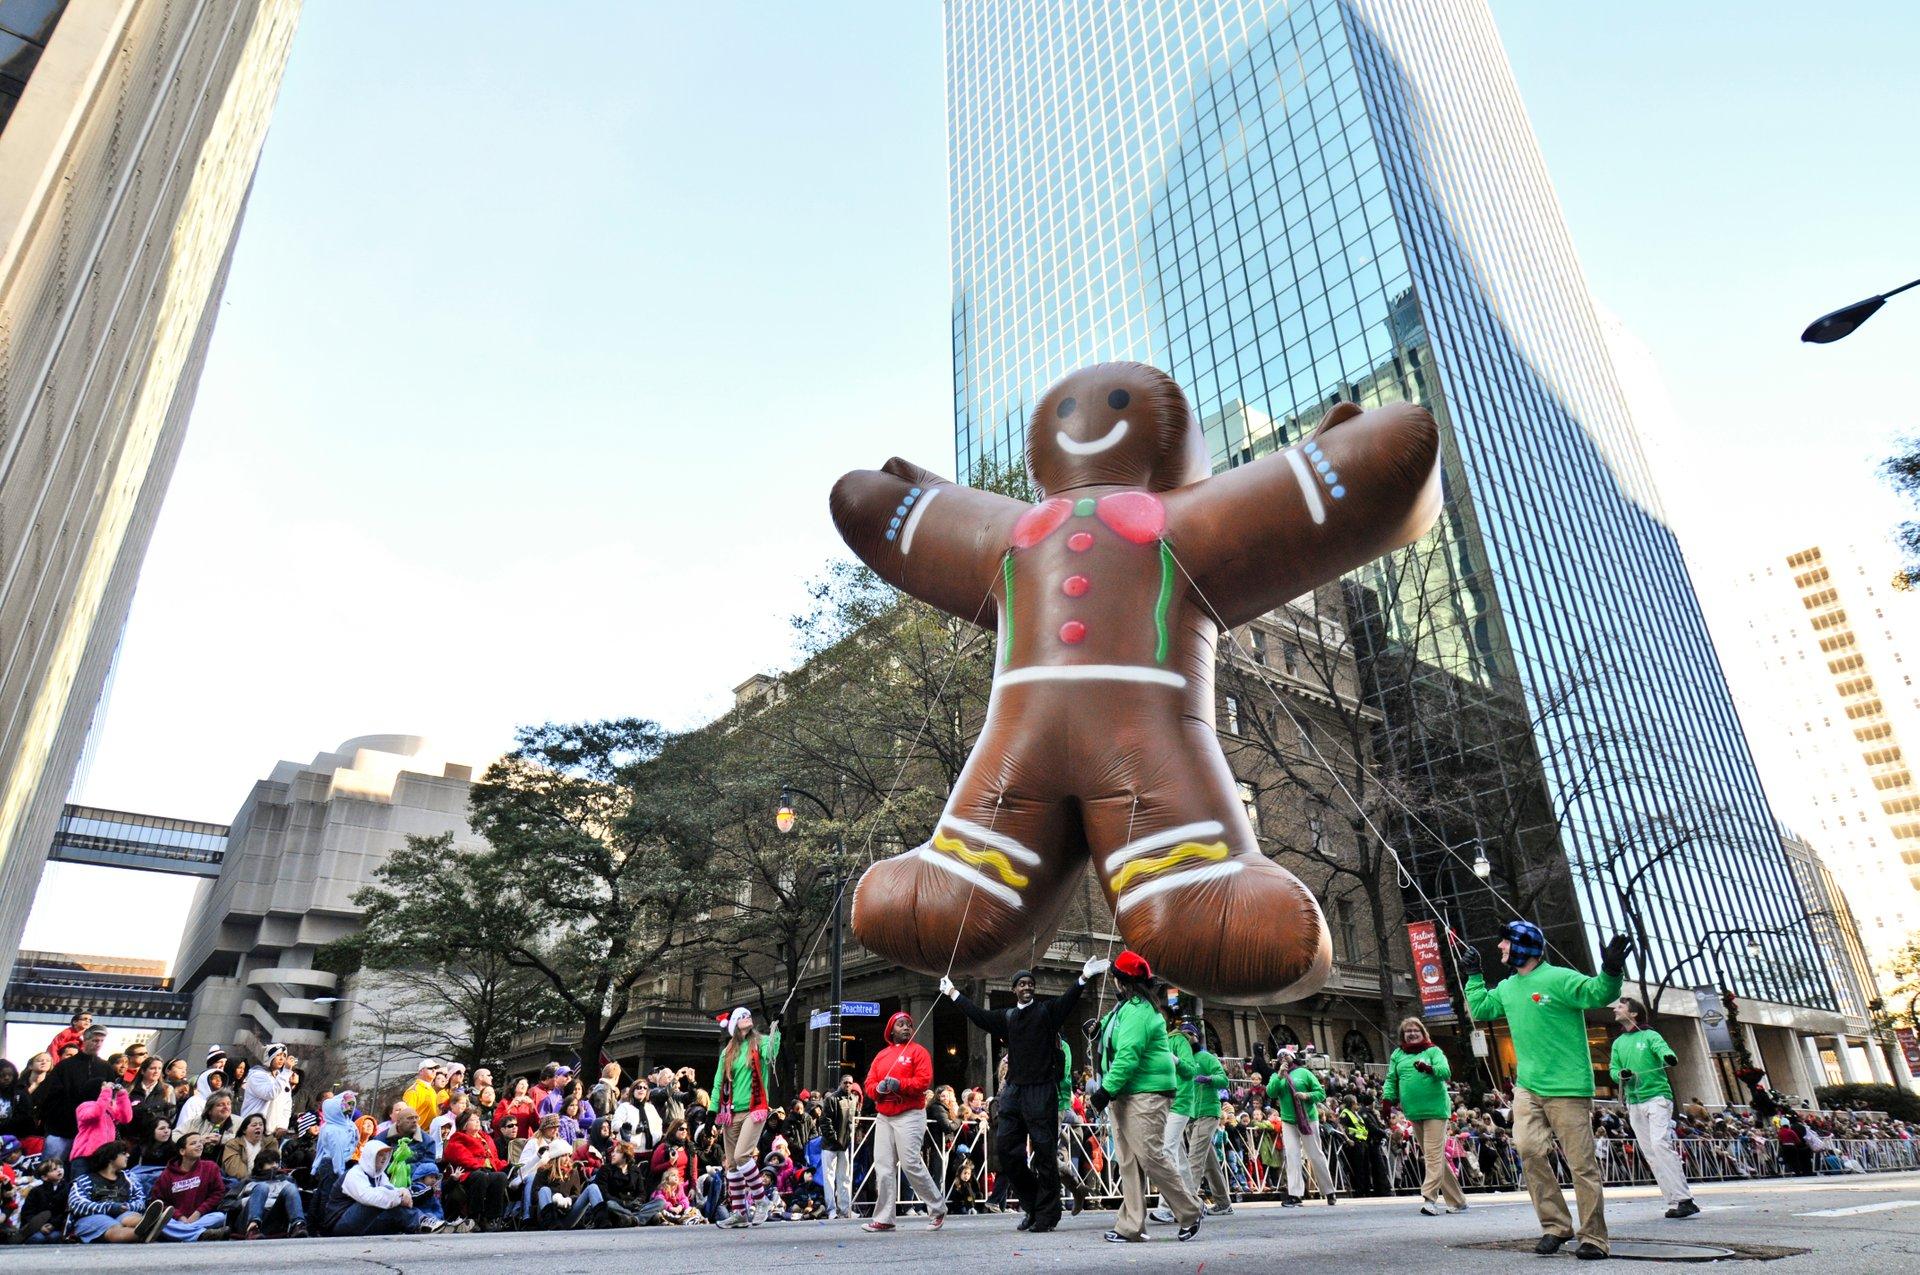 Children's Christmas Parade in Atlanta 2019 - Best Time